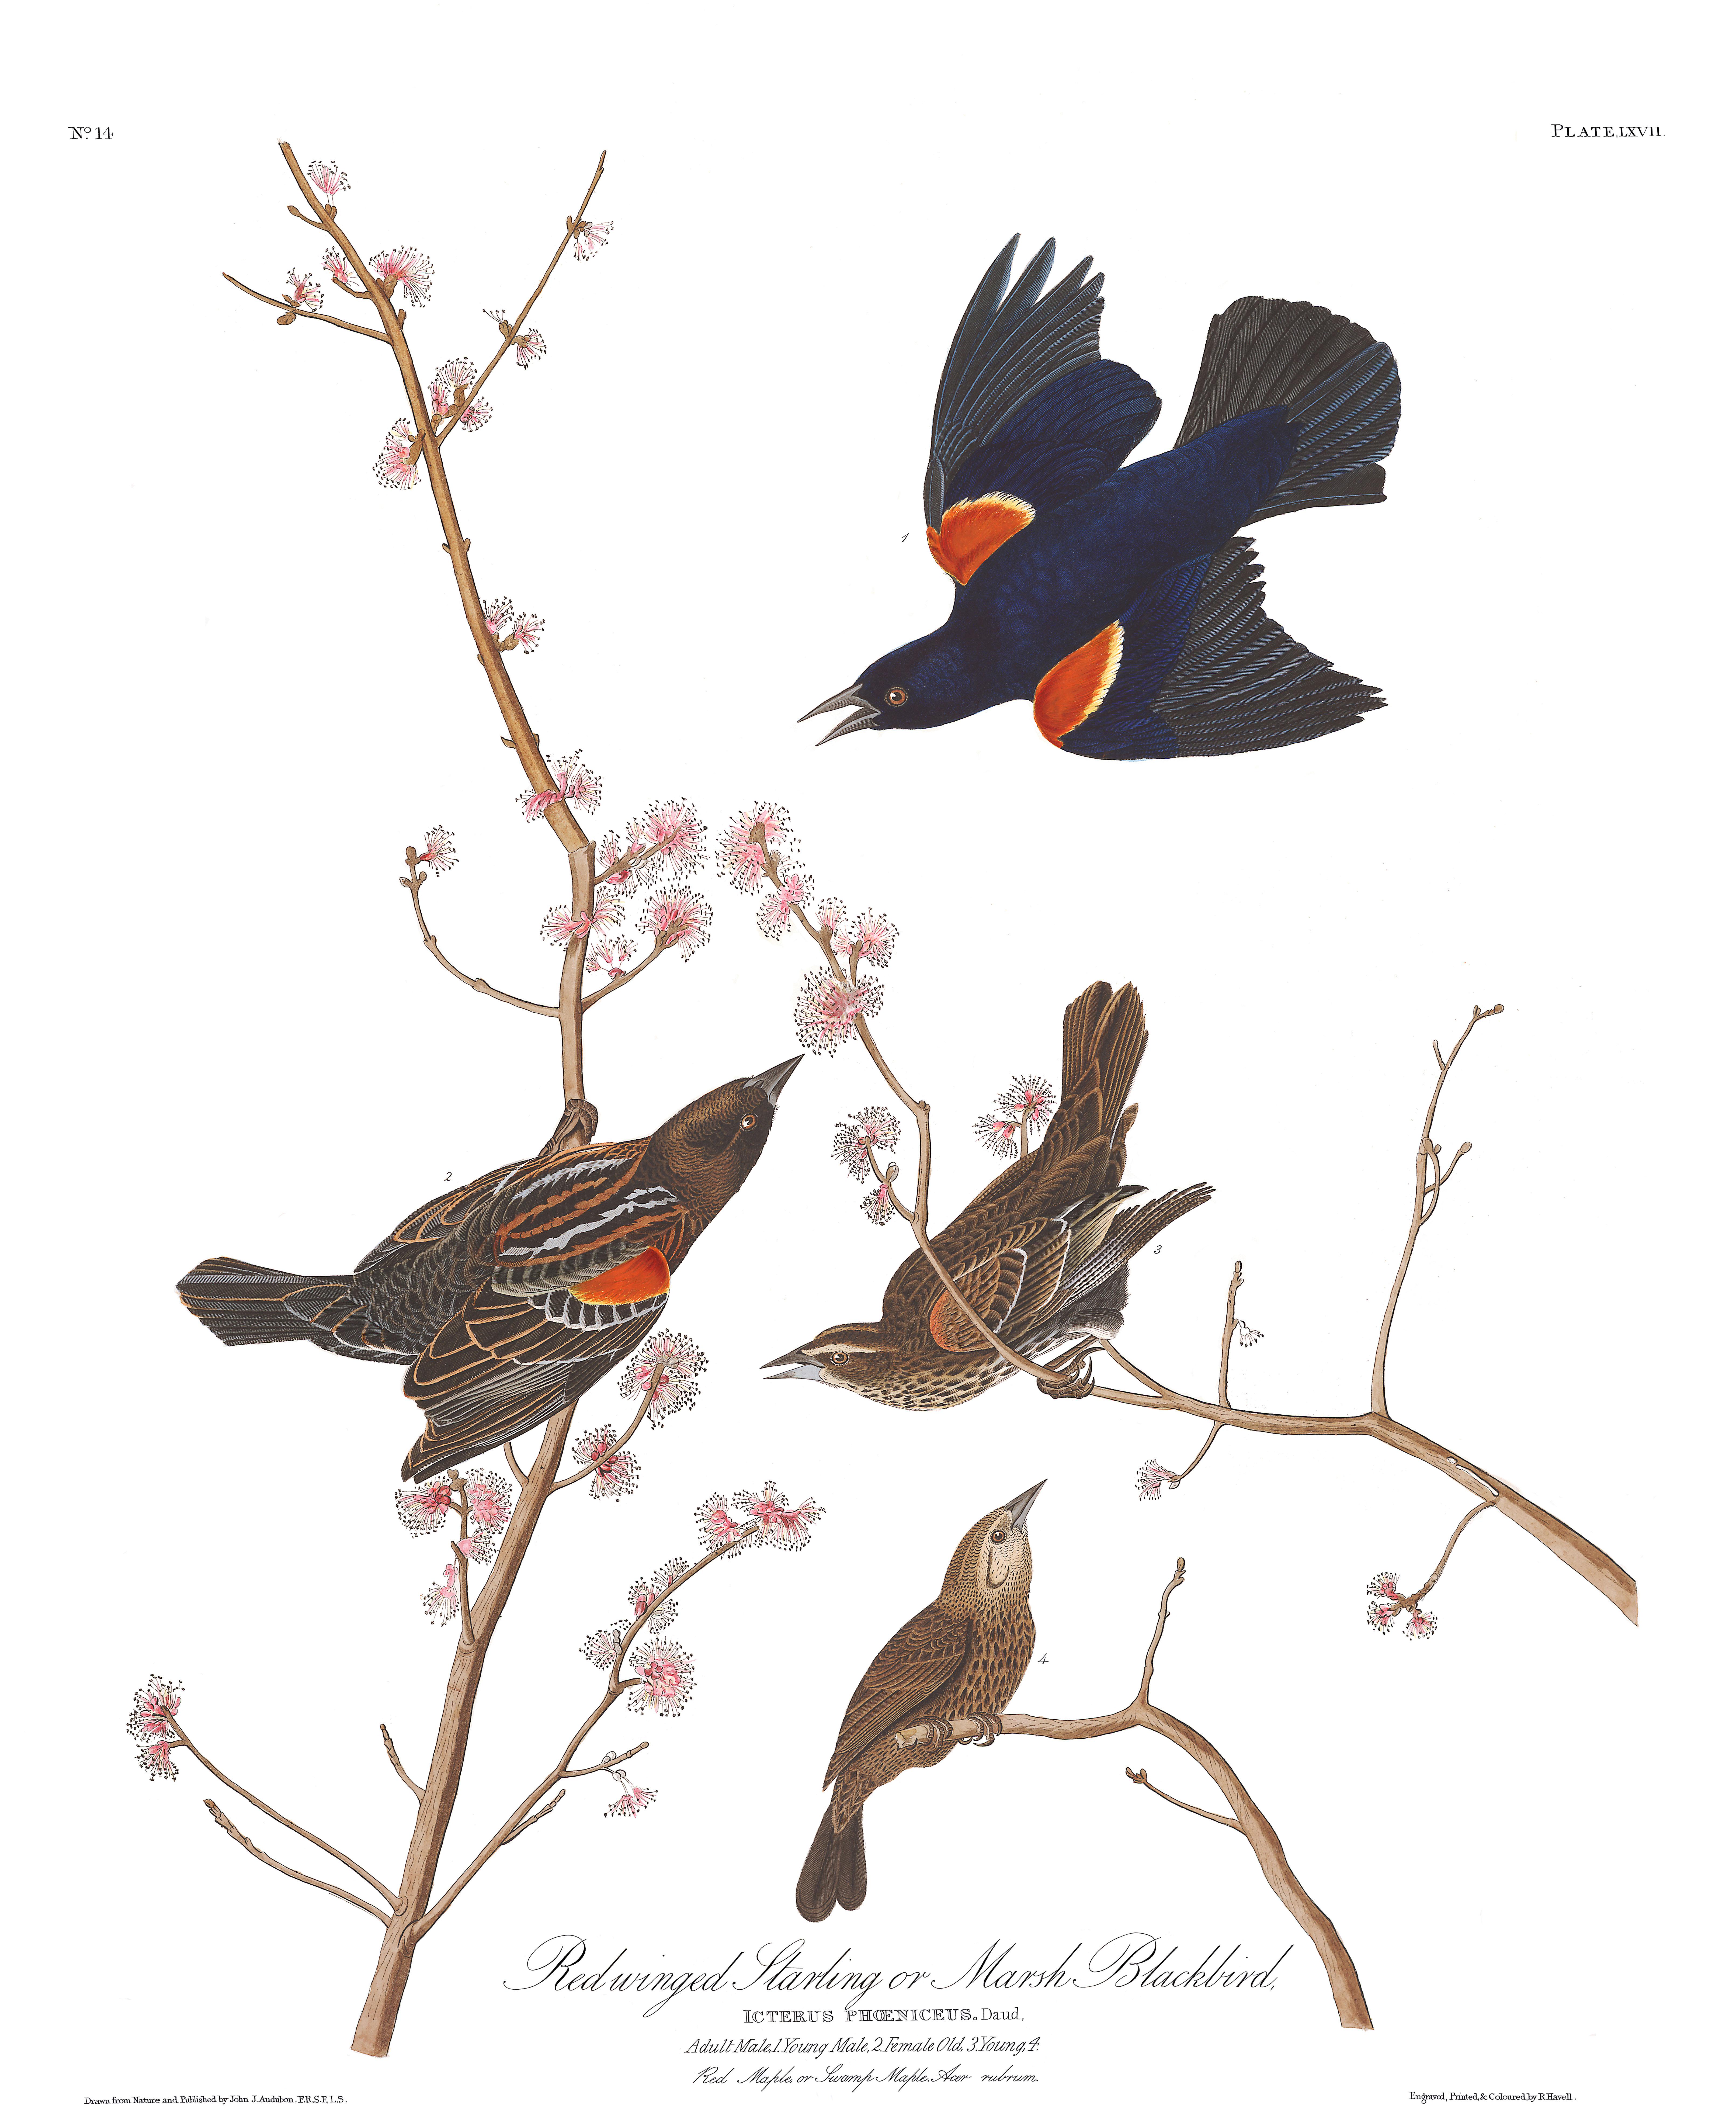 J.J. Audubon – Plate 67. Red-winged Starling, or Marsh Blackbird (Red-winged Blackbird)